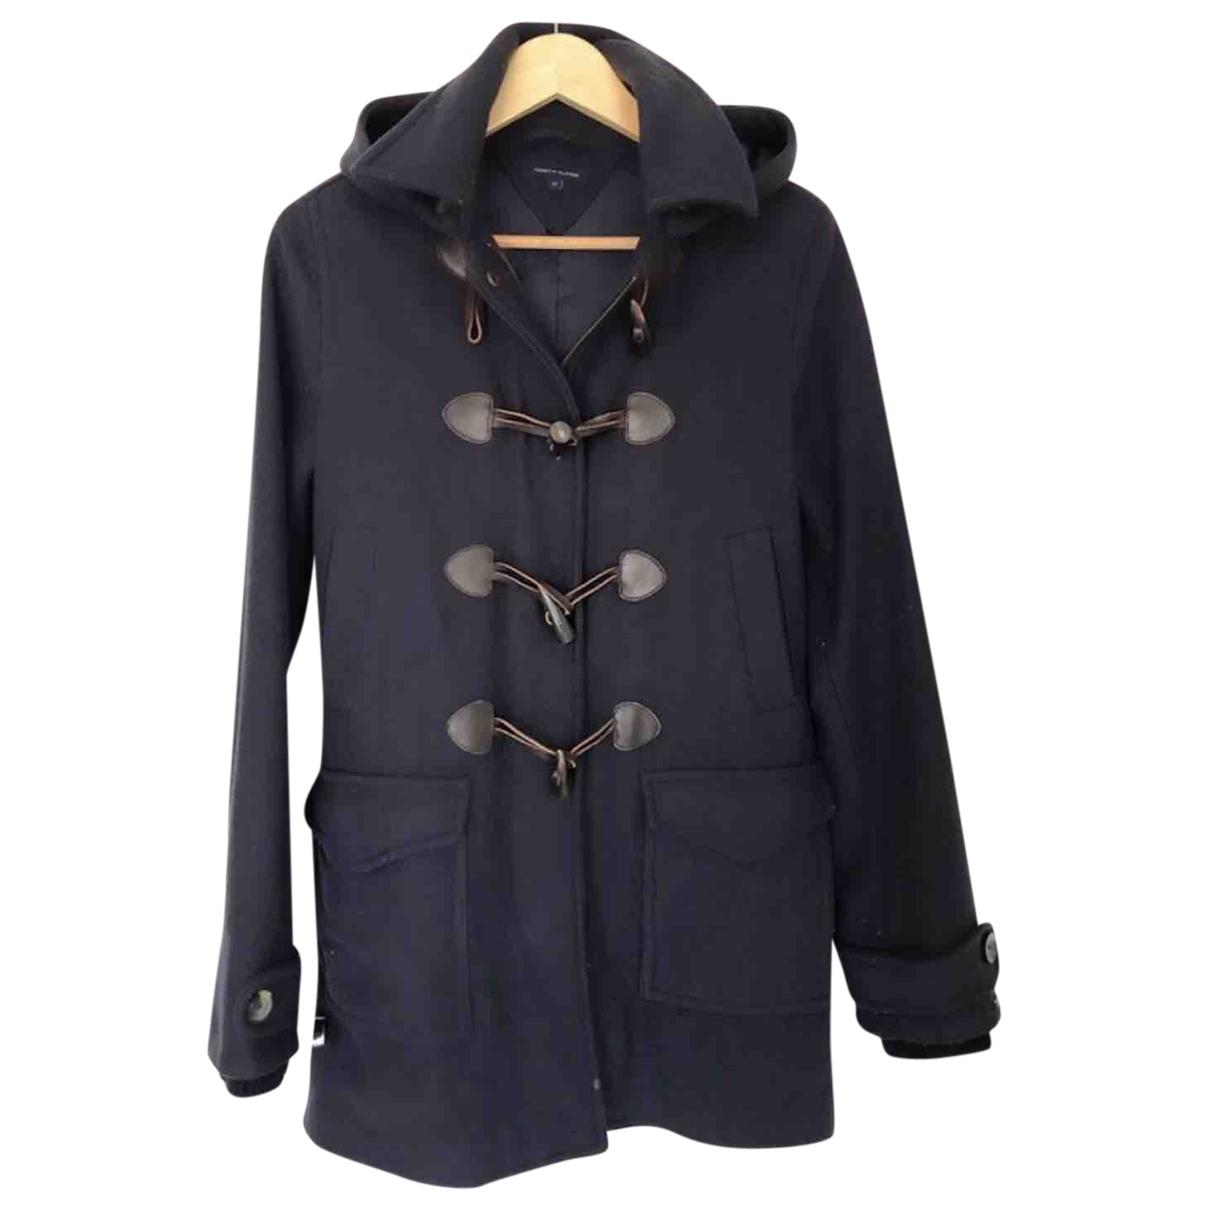 Tommy Hilfiger \N Navy Wool coat for Women S International